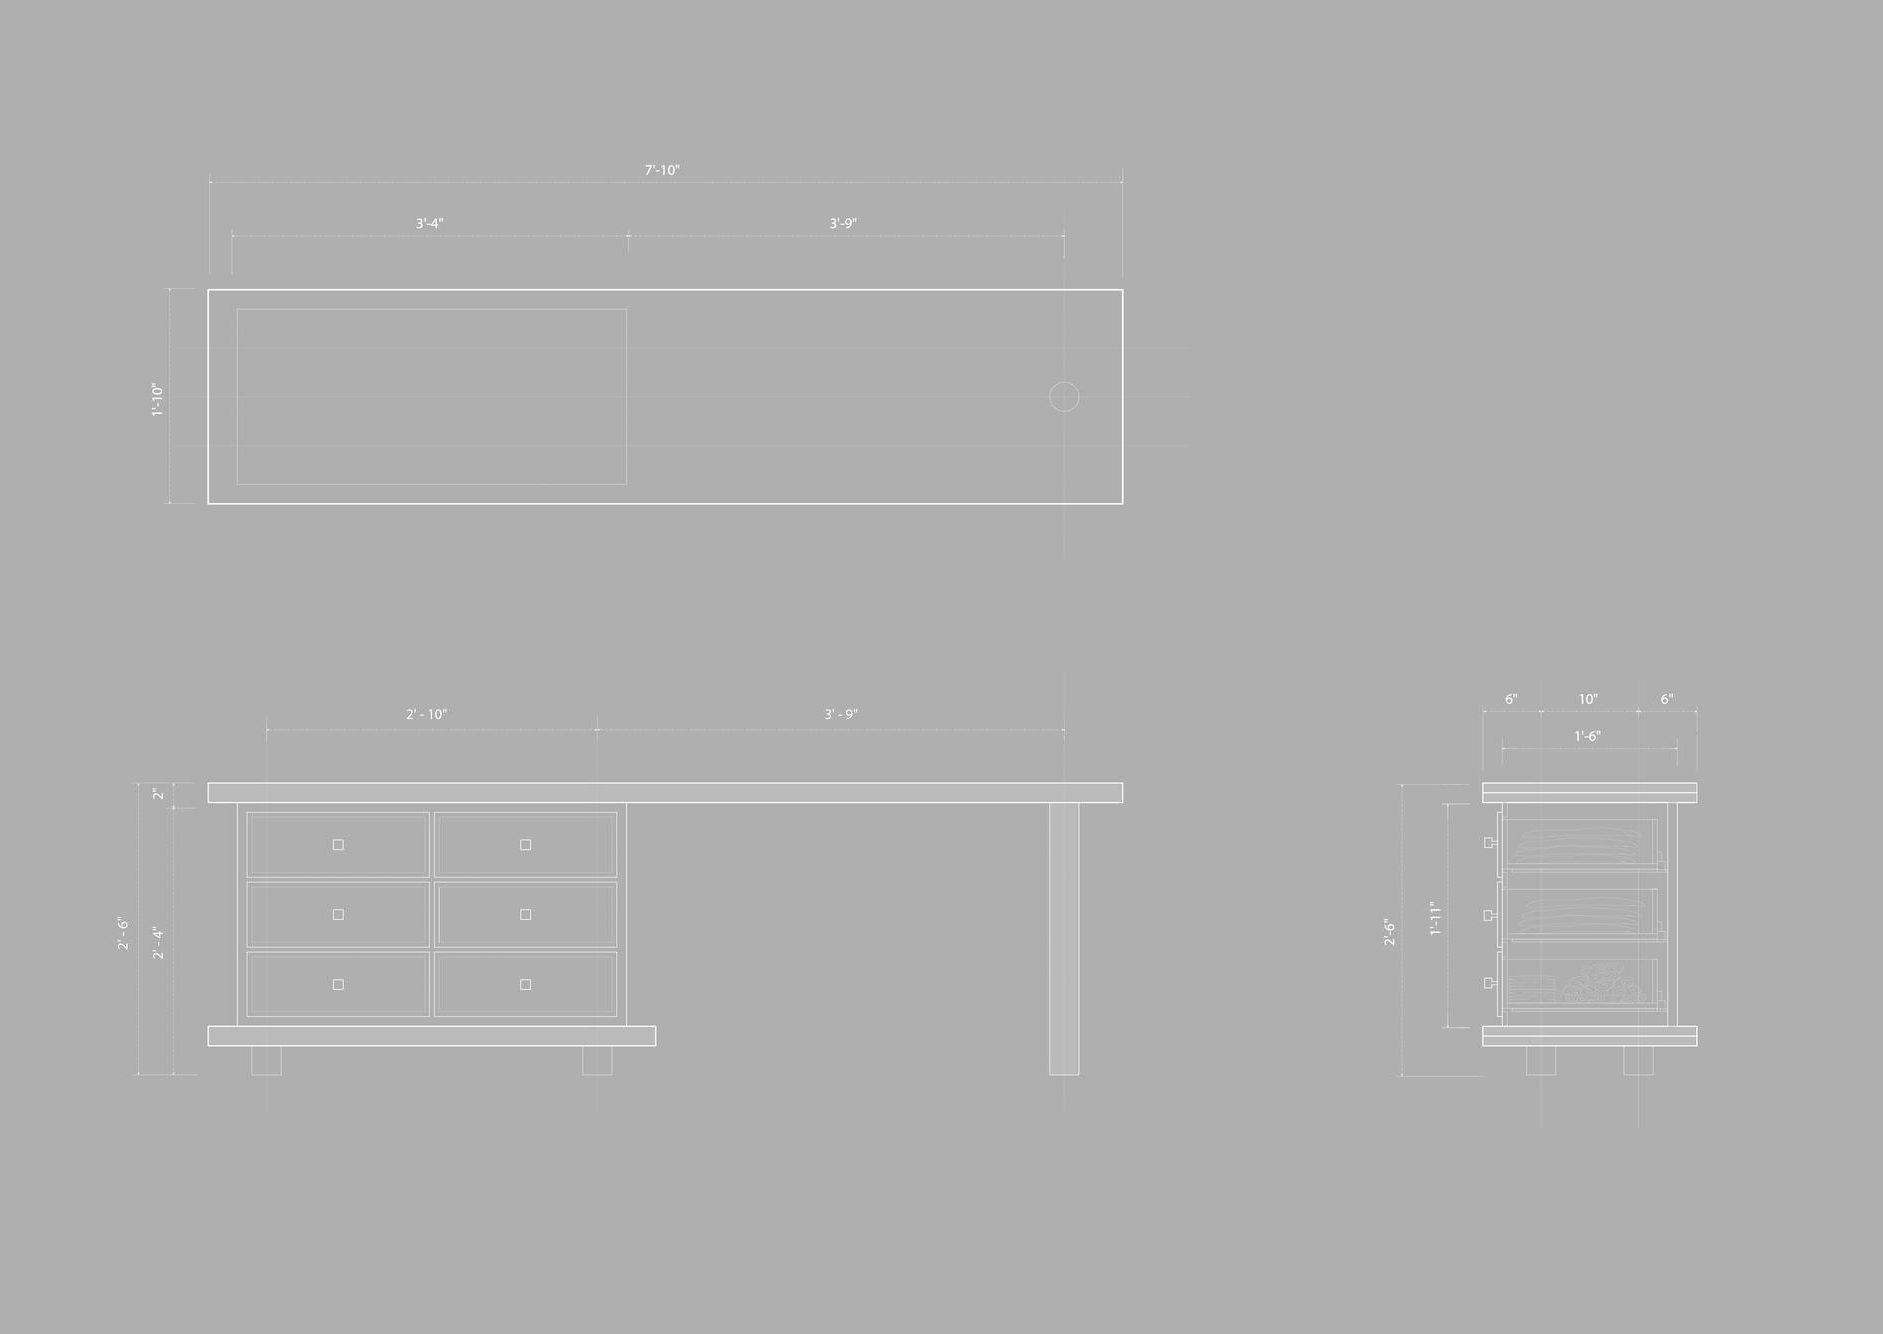 DRESSER-FOR-WEBSITE-PAGE-2-1883x1334 strategic design consultancy